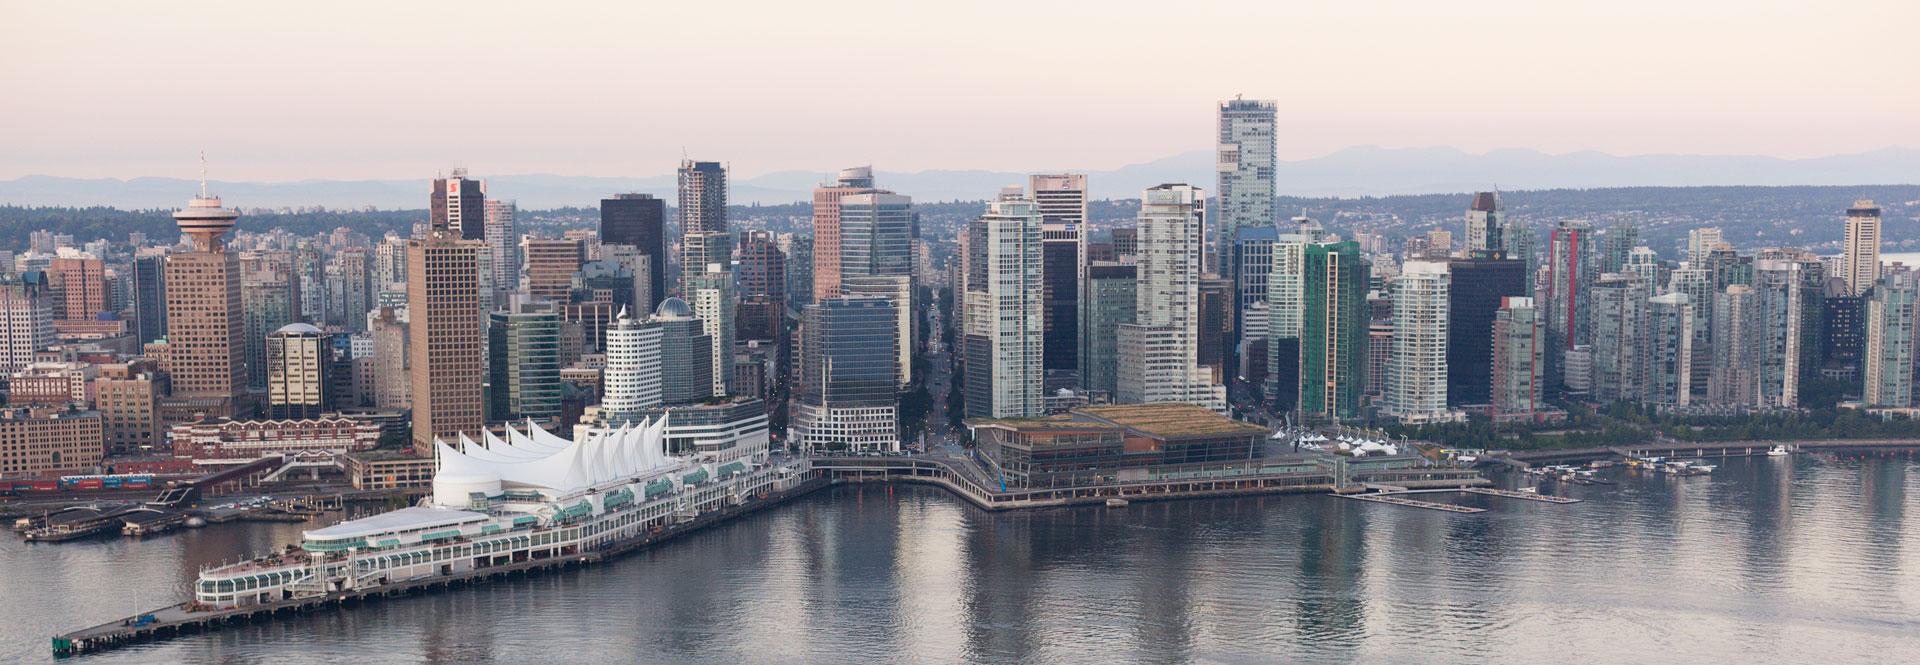 Tourism-Vancouver-Aerial-Albert-Normandin-20111